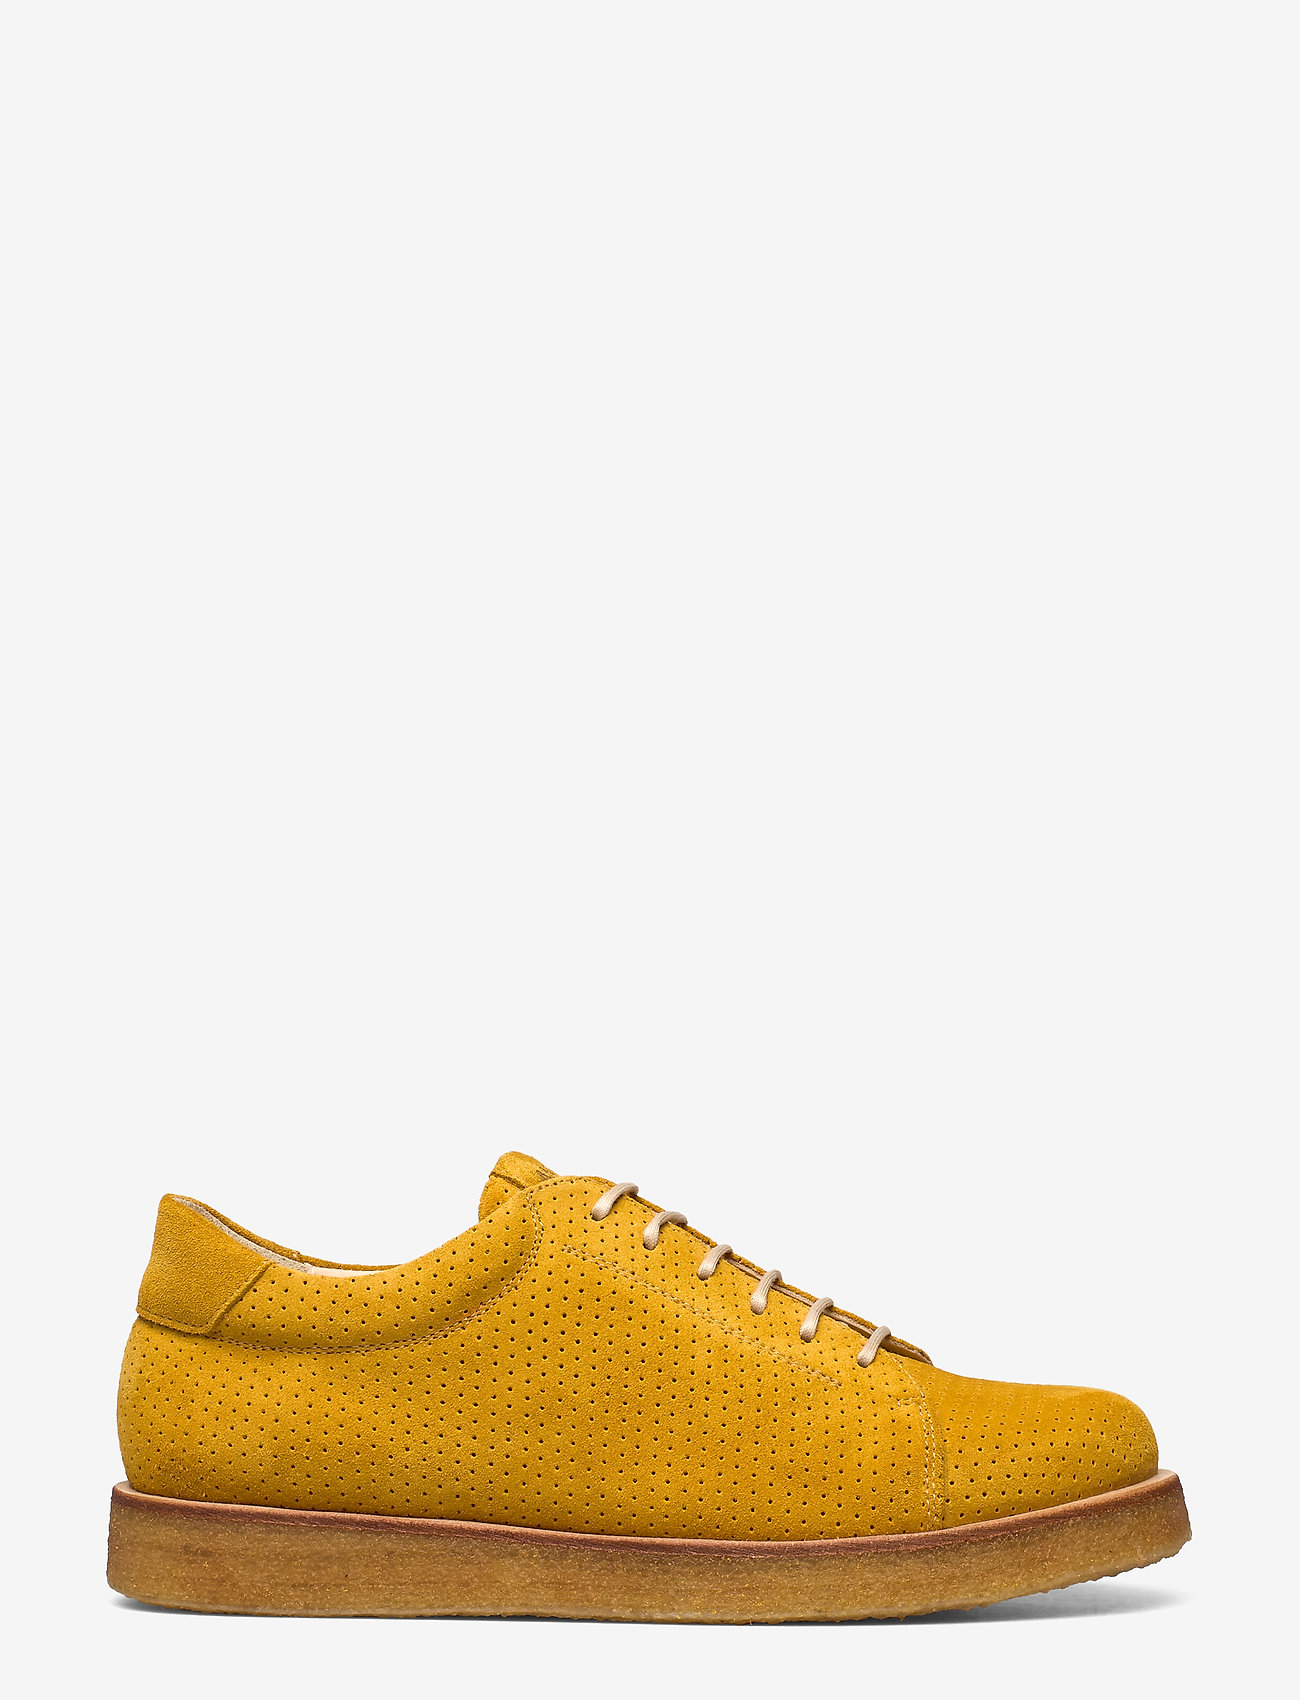 ANGULUS - Shoes - flat - with lace - buty sznurowane - 2201 yellow - 1